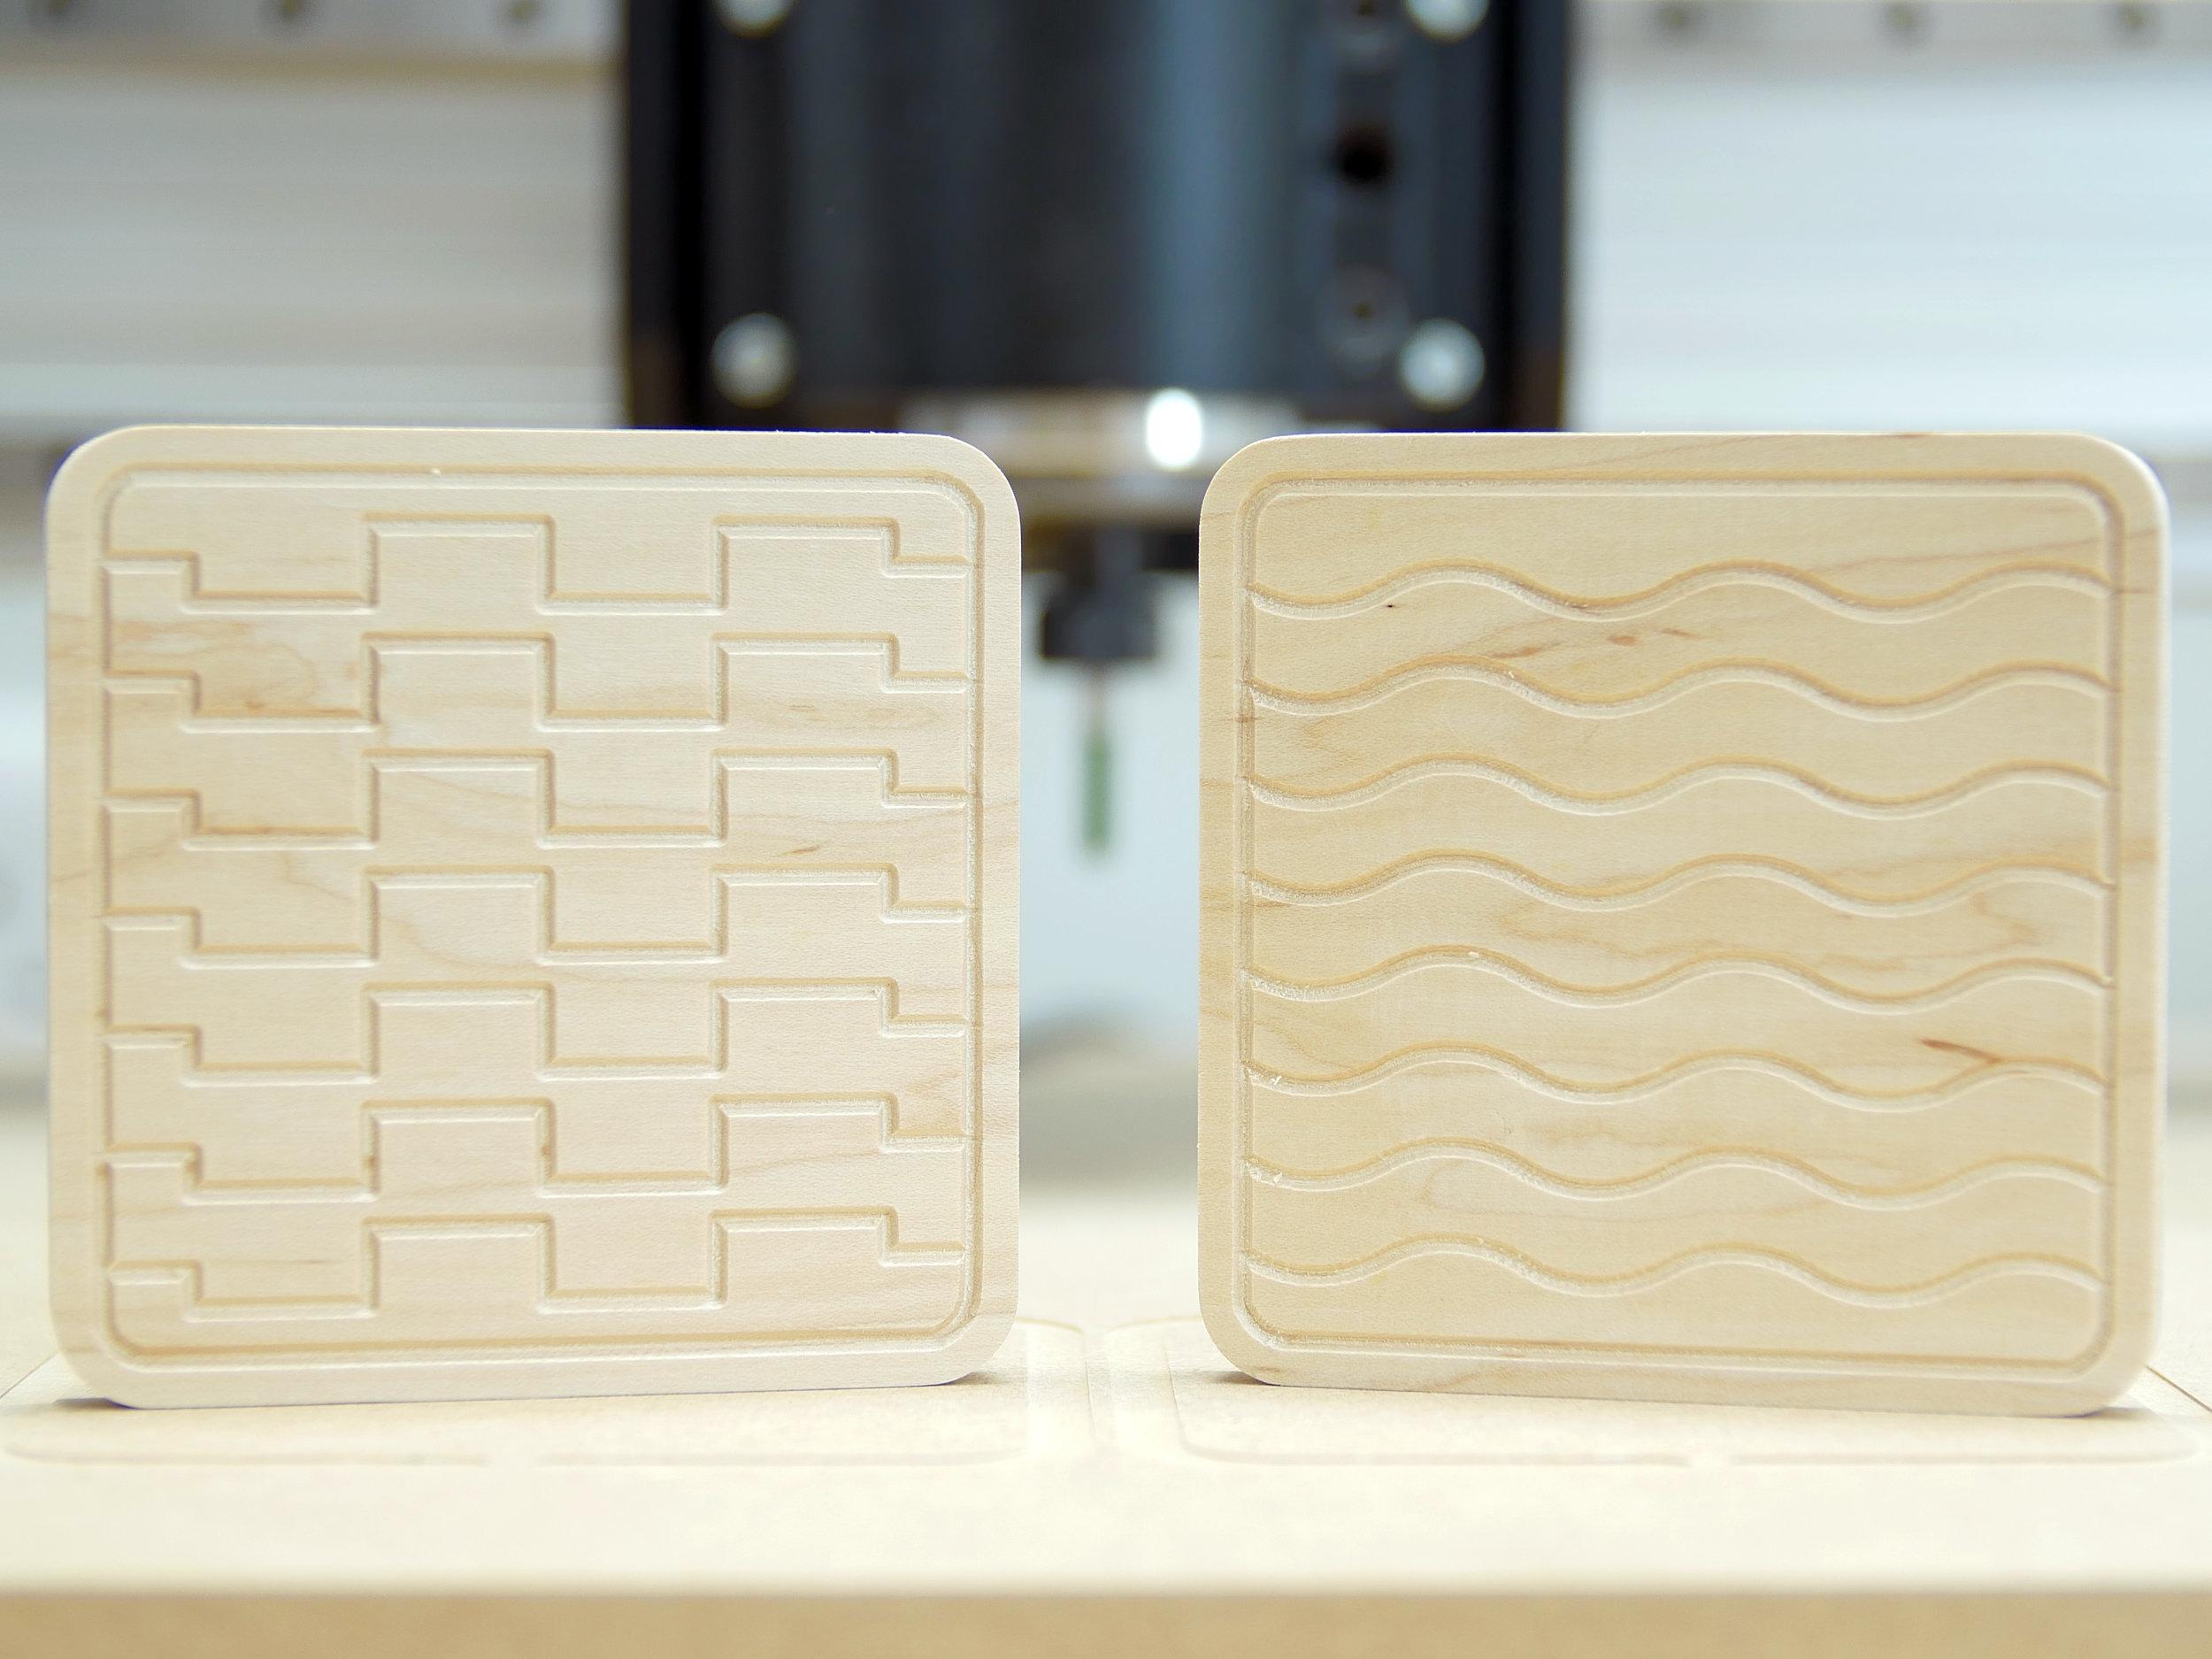 10mm Maple Coasters